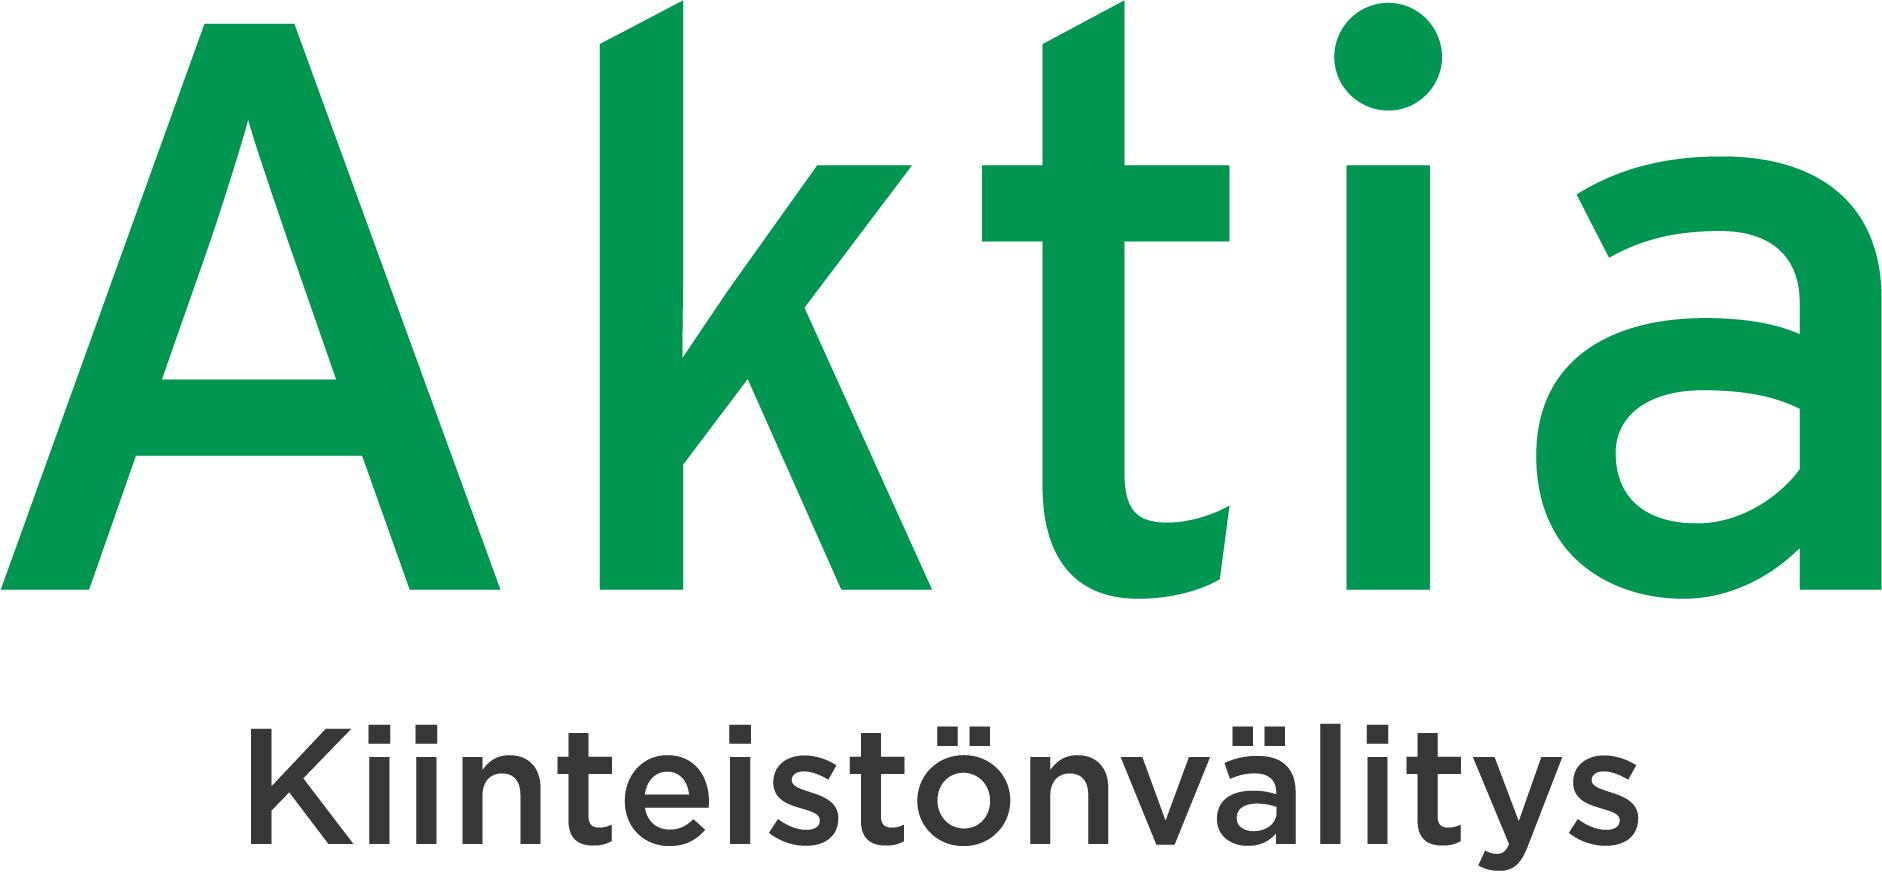 Aktia Kiinteistönvälitys Oy,Tampere, Aktia Fastighetsförmedl